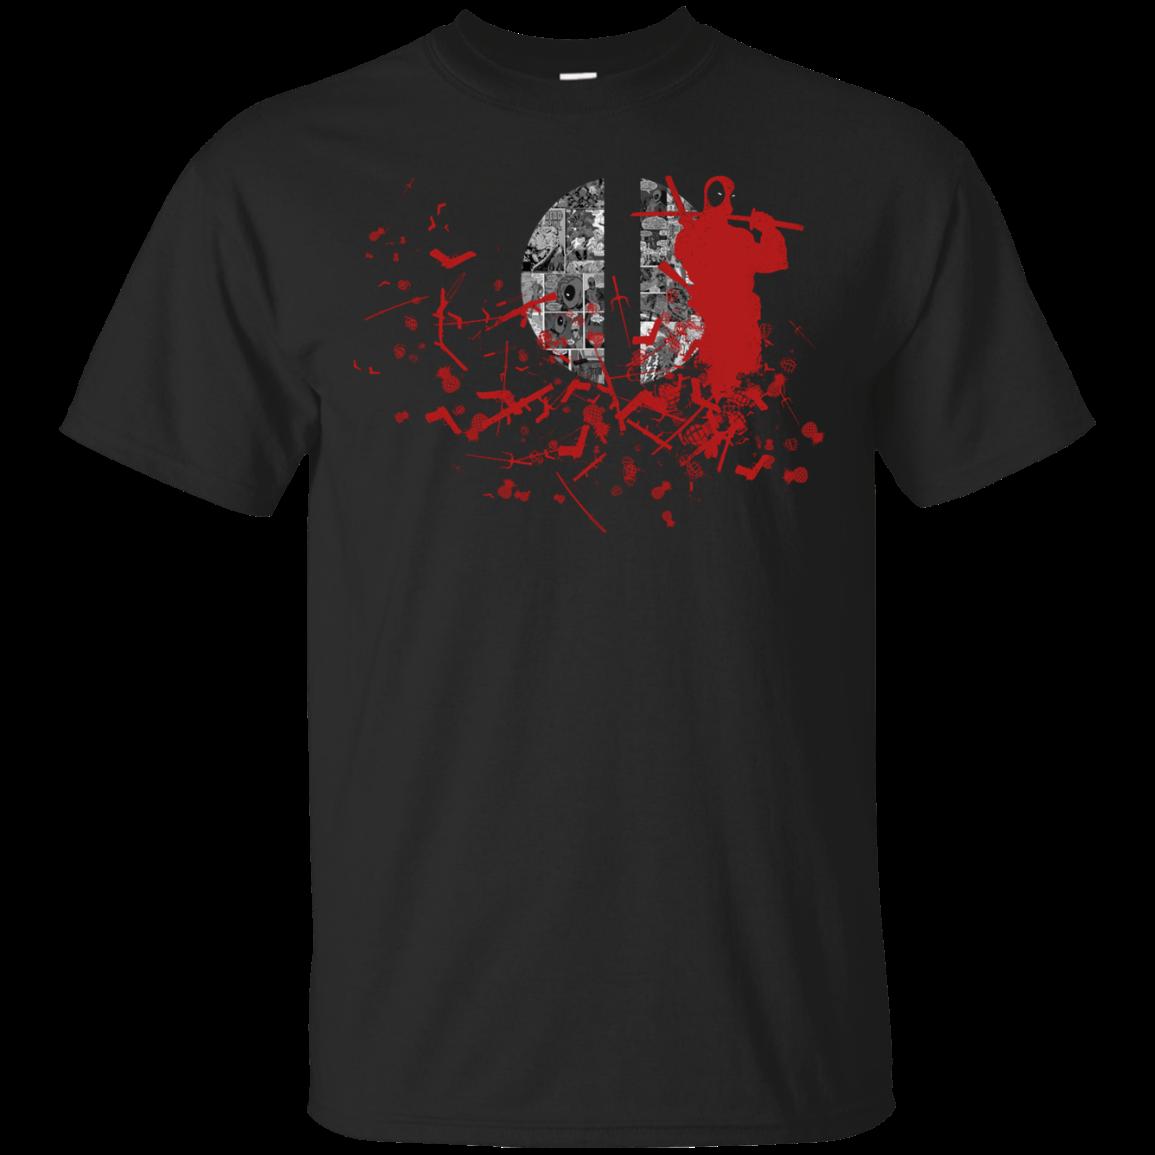 Top Selling Great Deadpool Deadpool 139 Poolauto Shirts